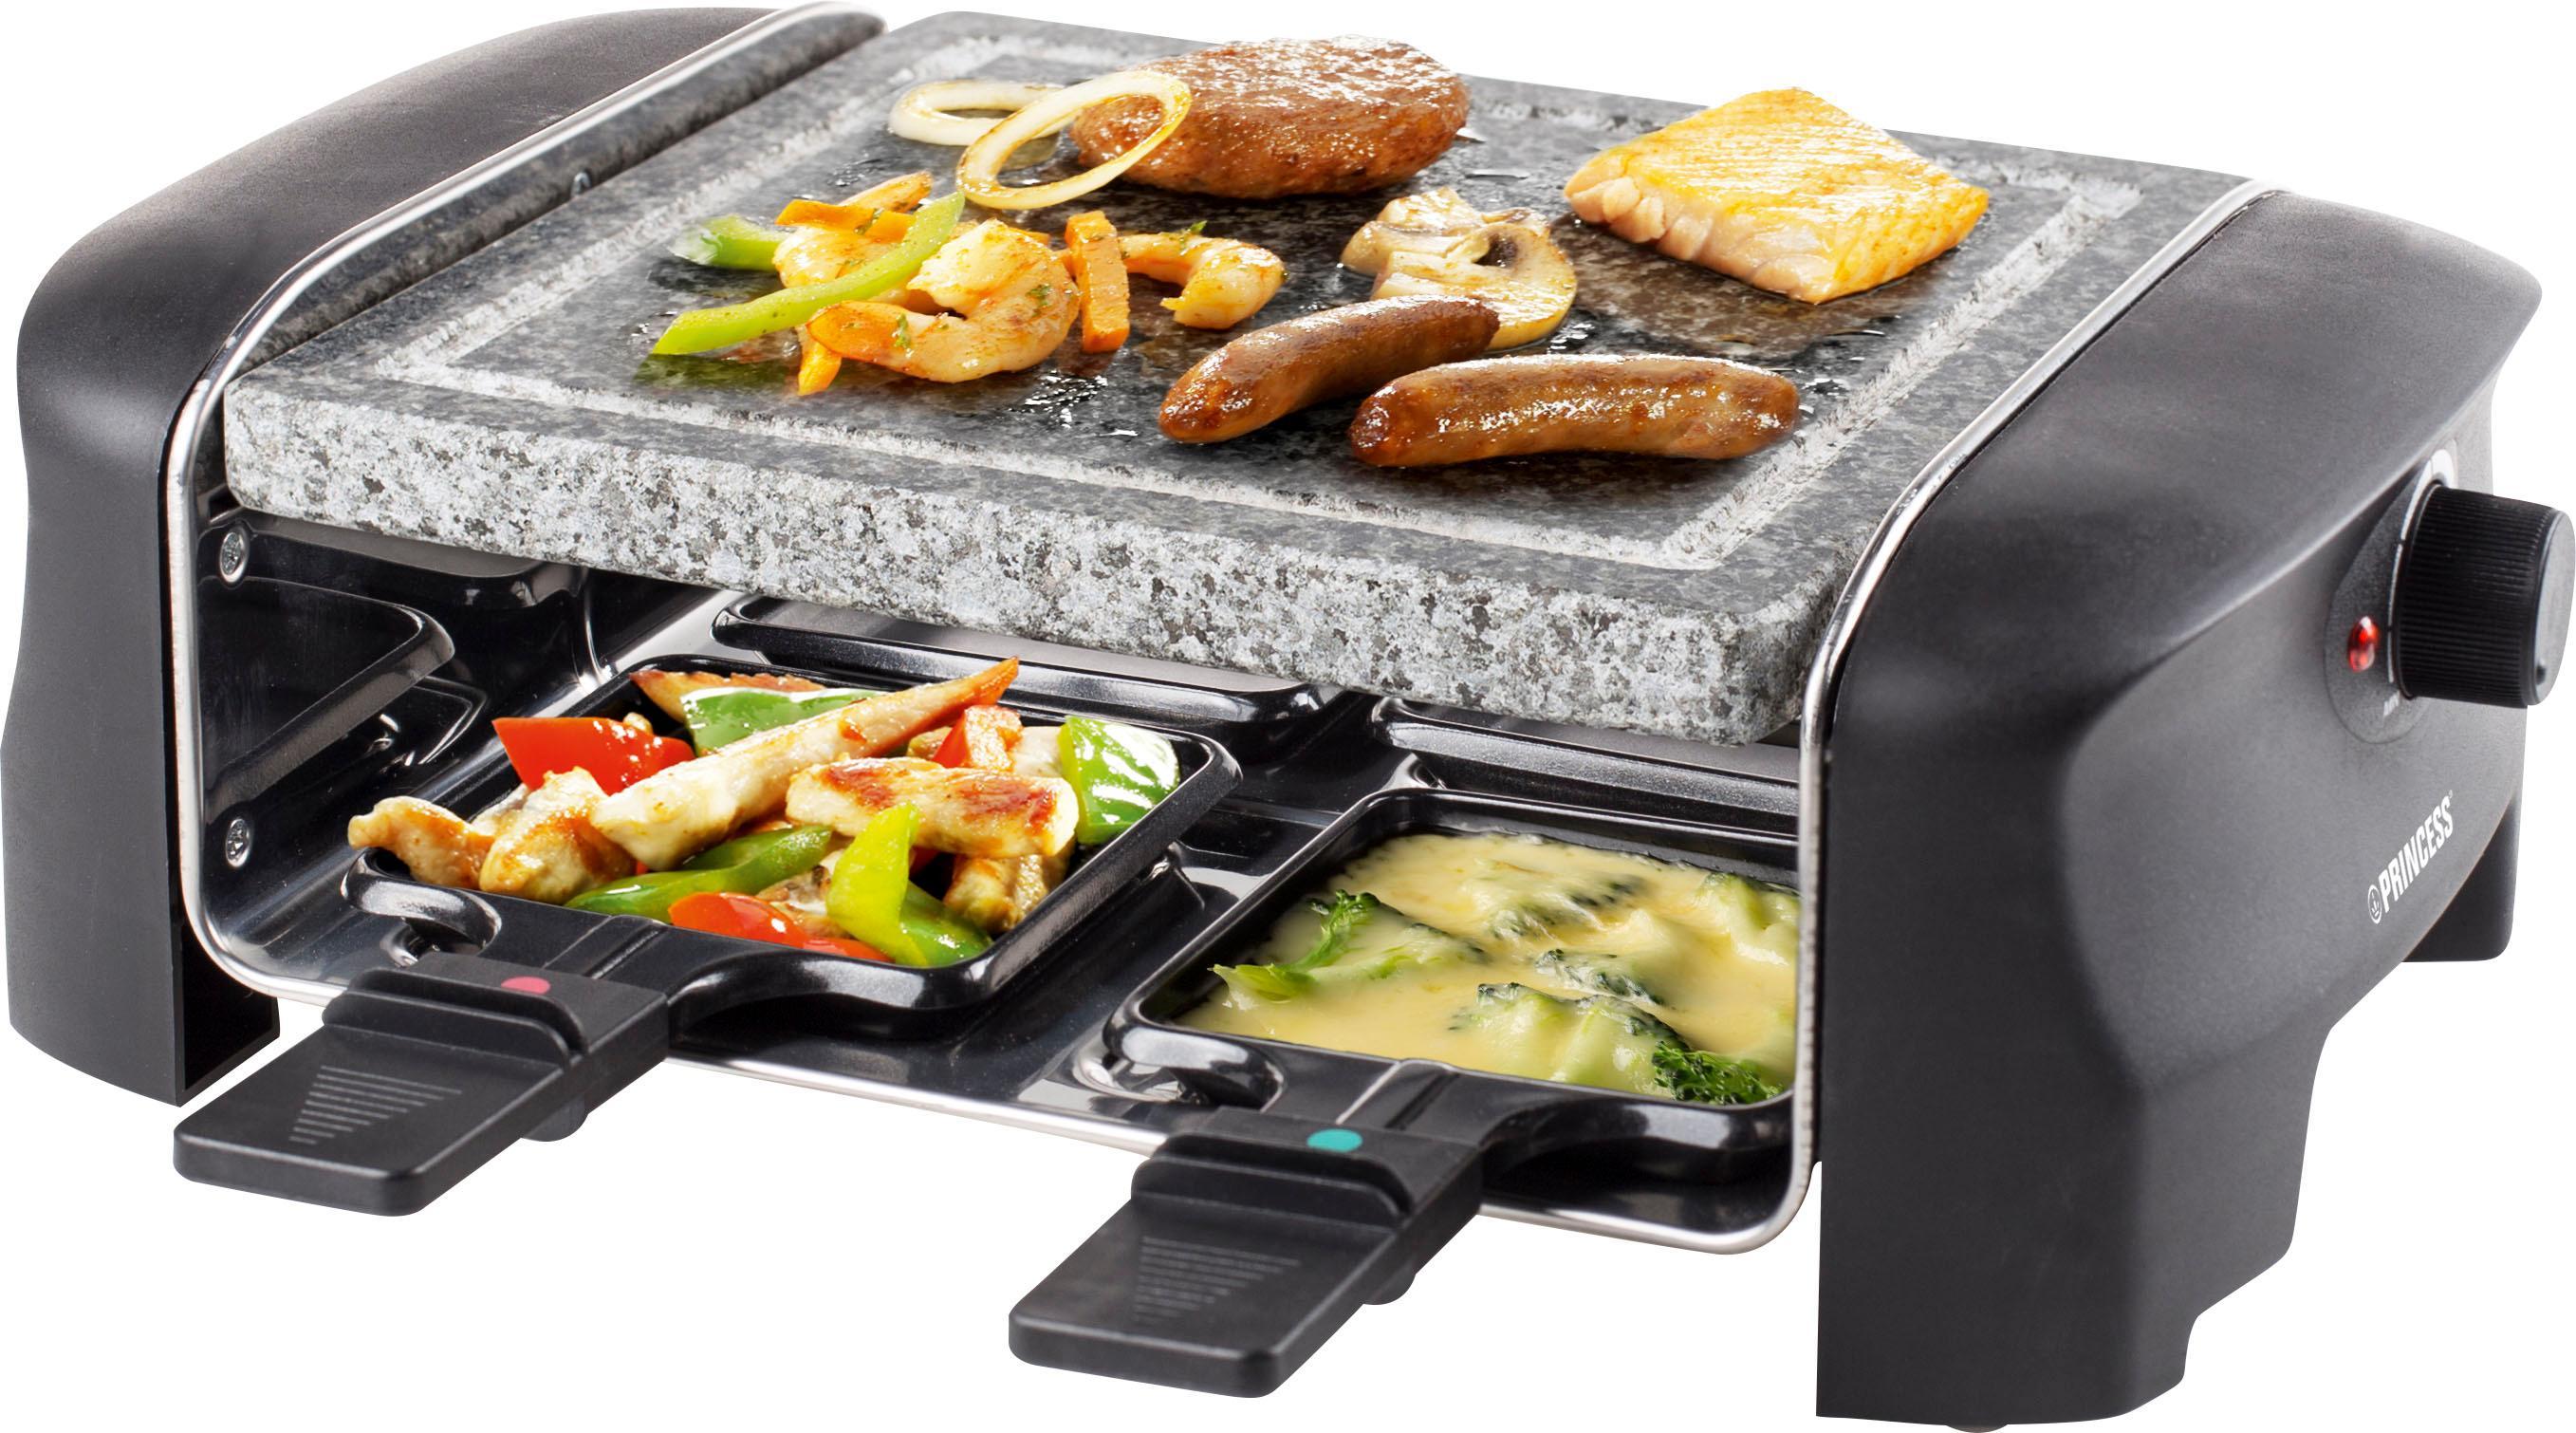 raclette hei er stein thermostat princess 162810 raclettegrill racletteger t g nstig kaufen ebay. Black Bedroom Furniture Sets. Home Design Ideas